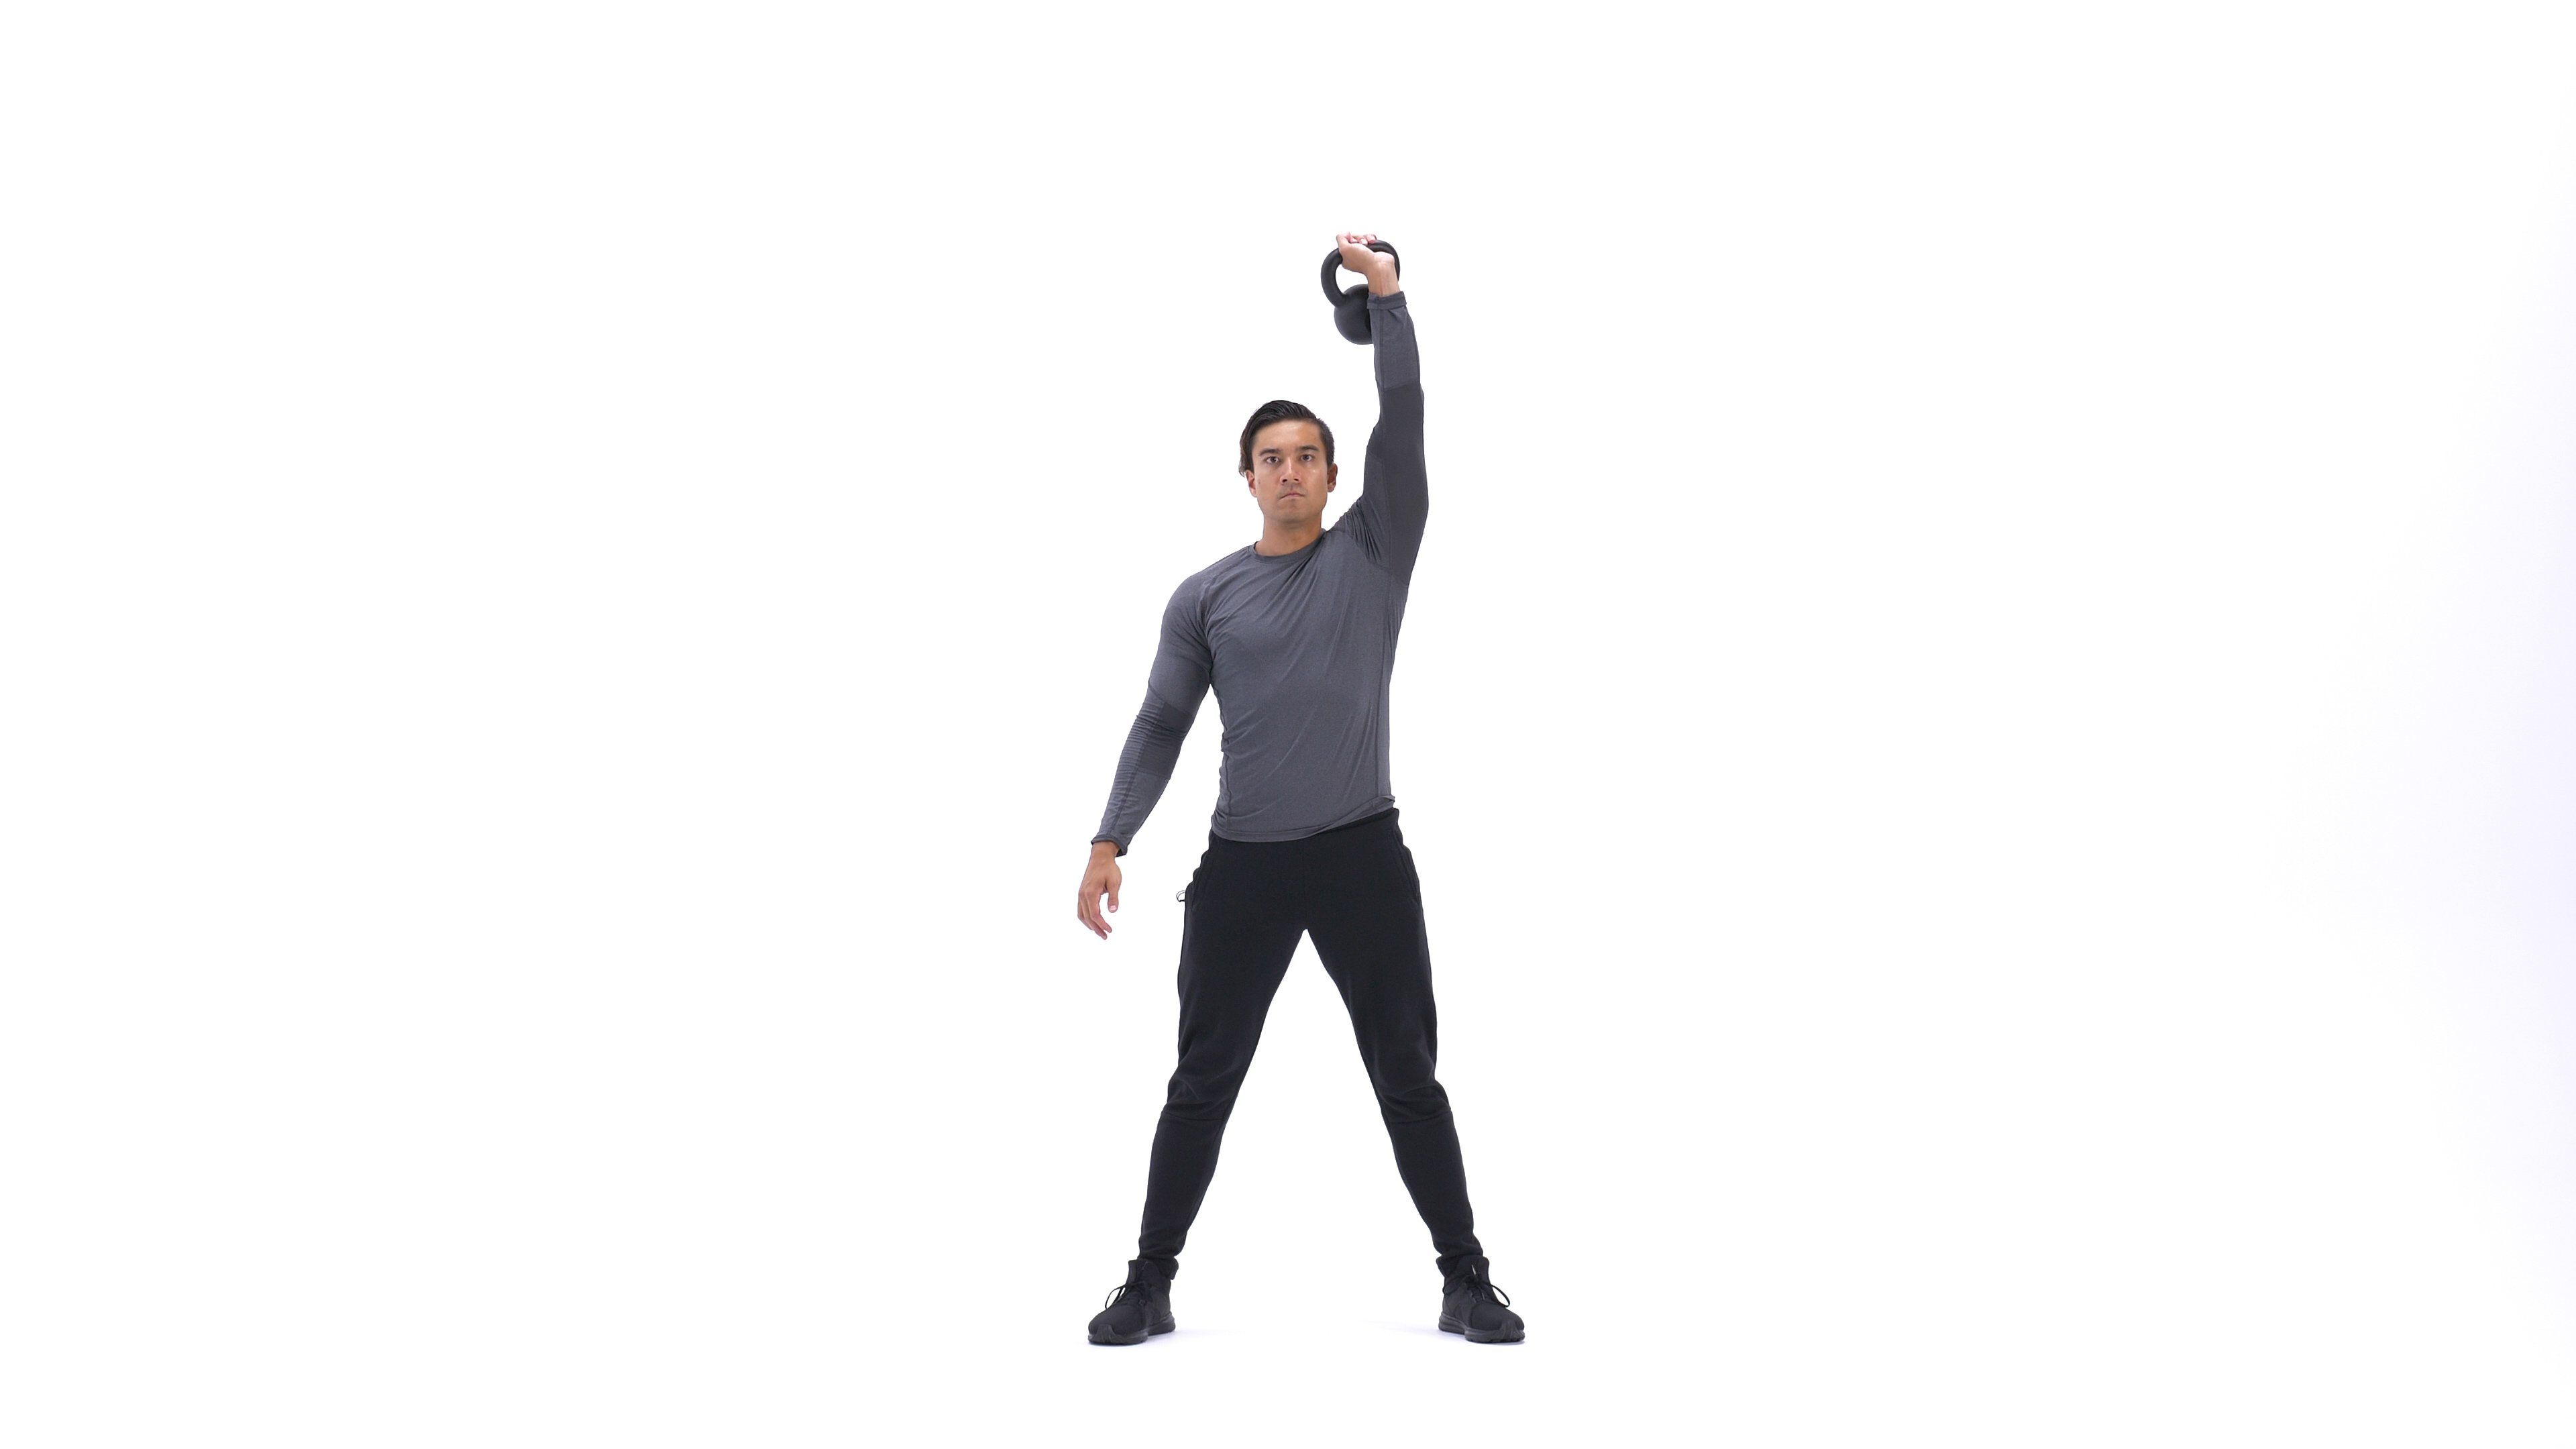 Single Arm Overhead Kettlebell Squat image